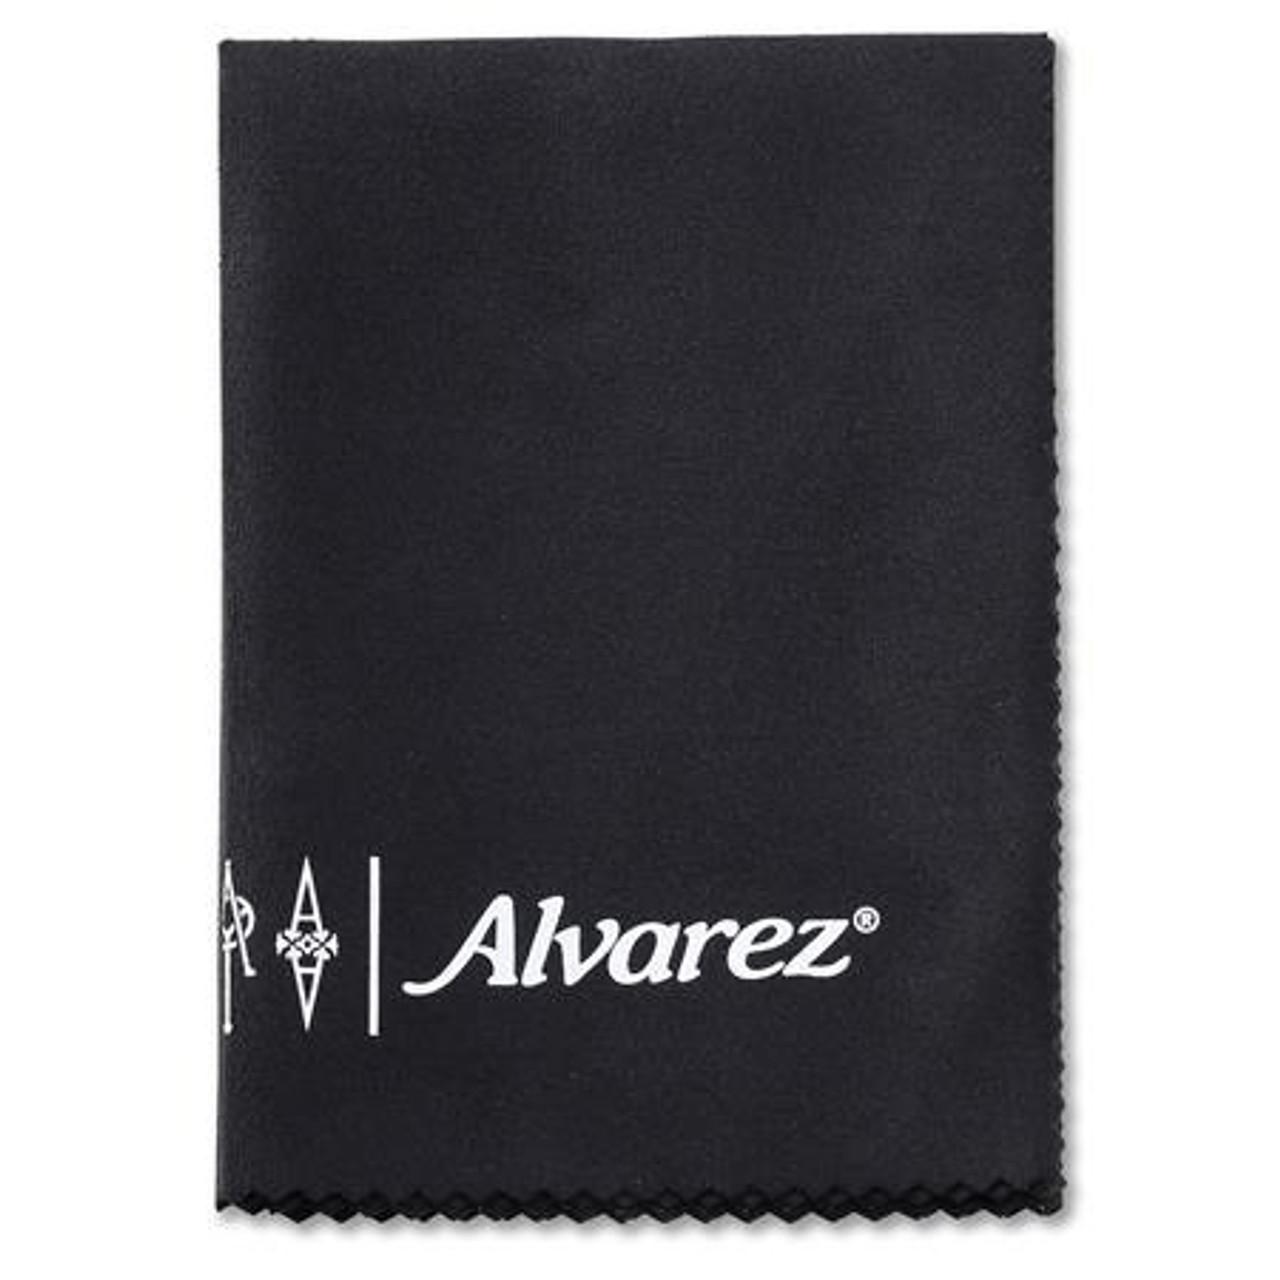 Alvarez Polishing Cloth